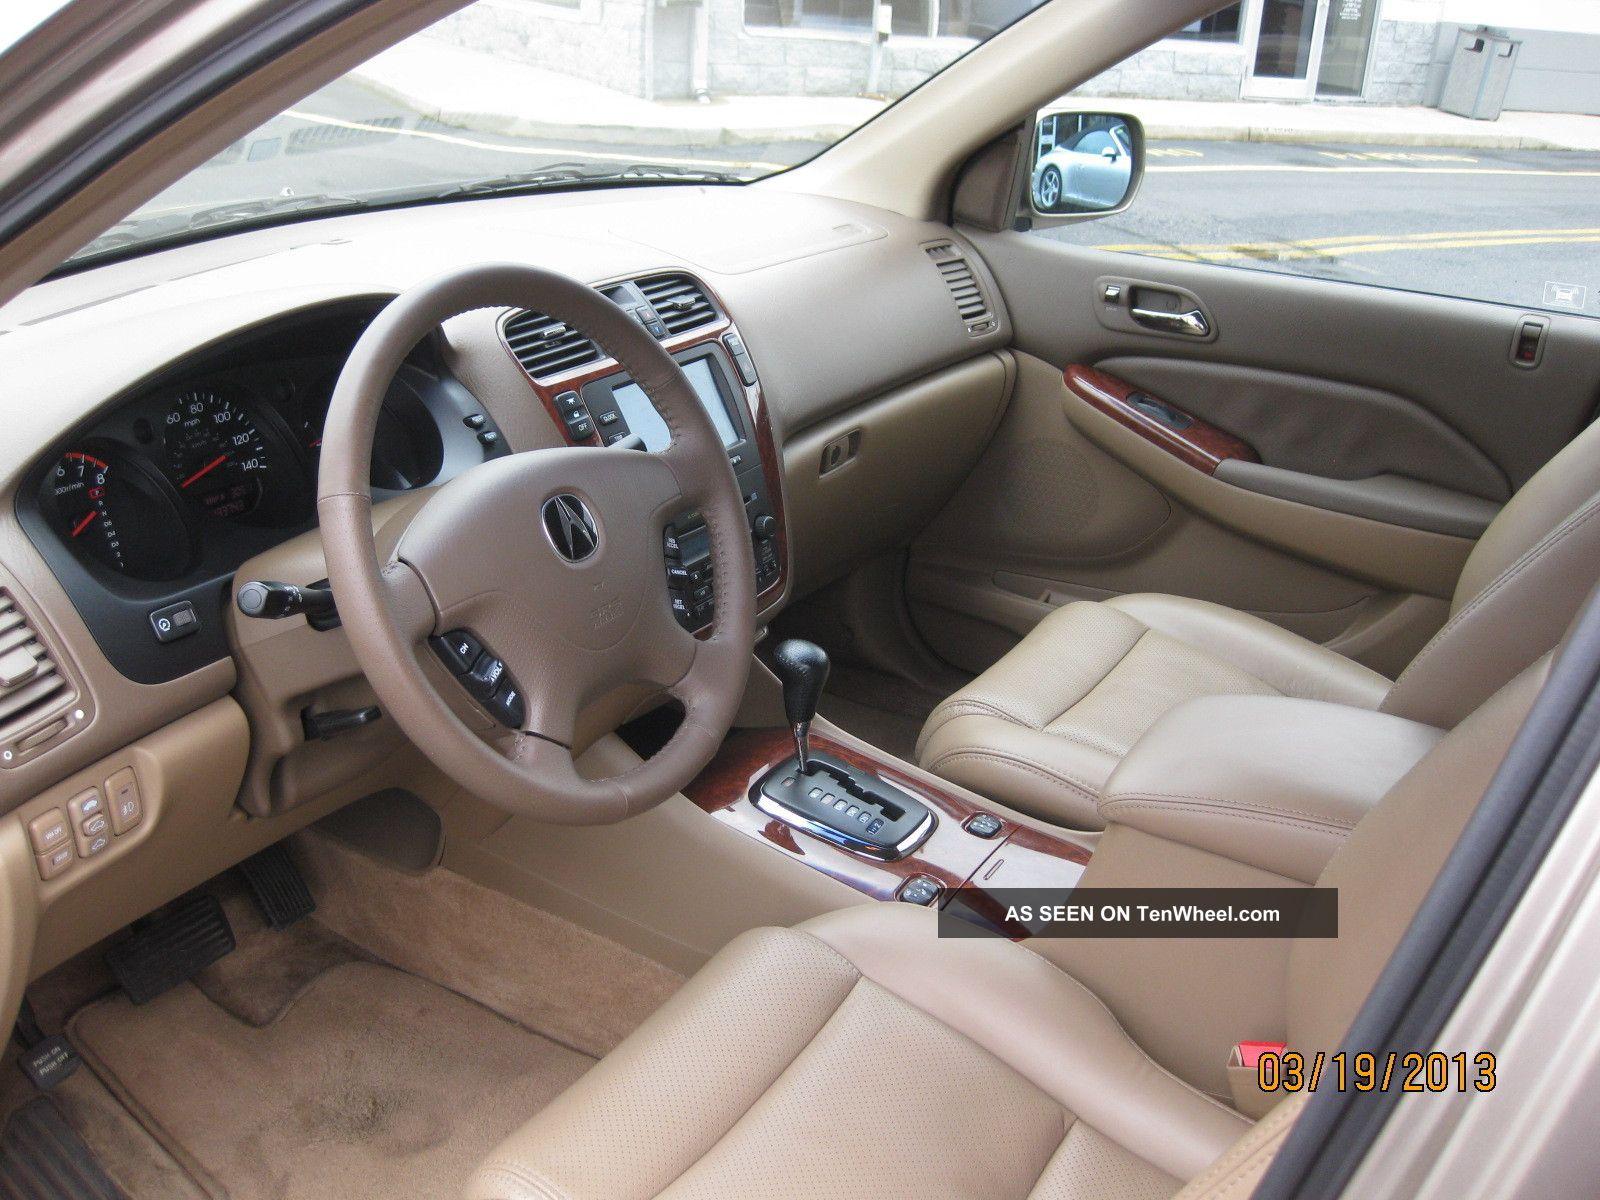 2003 Acura Mdx Touring Sport Utility 4